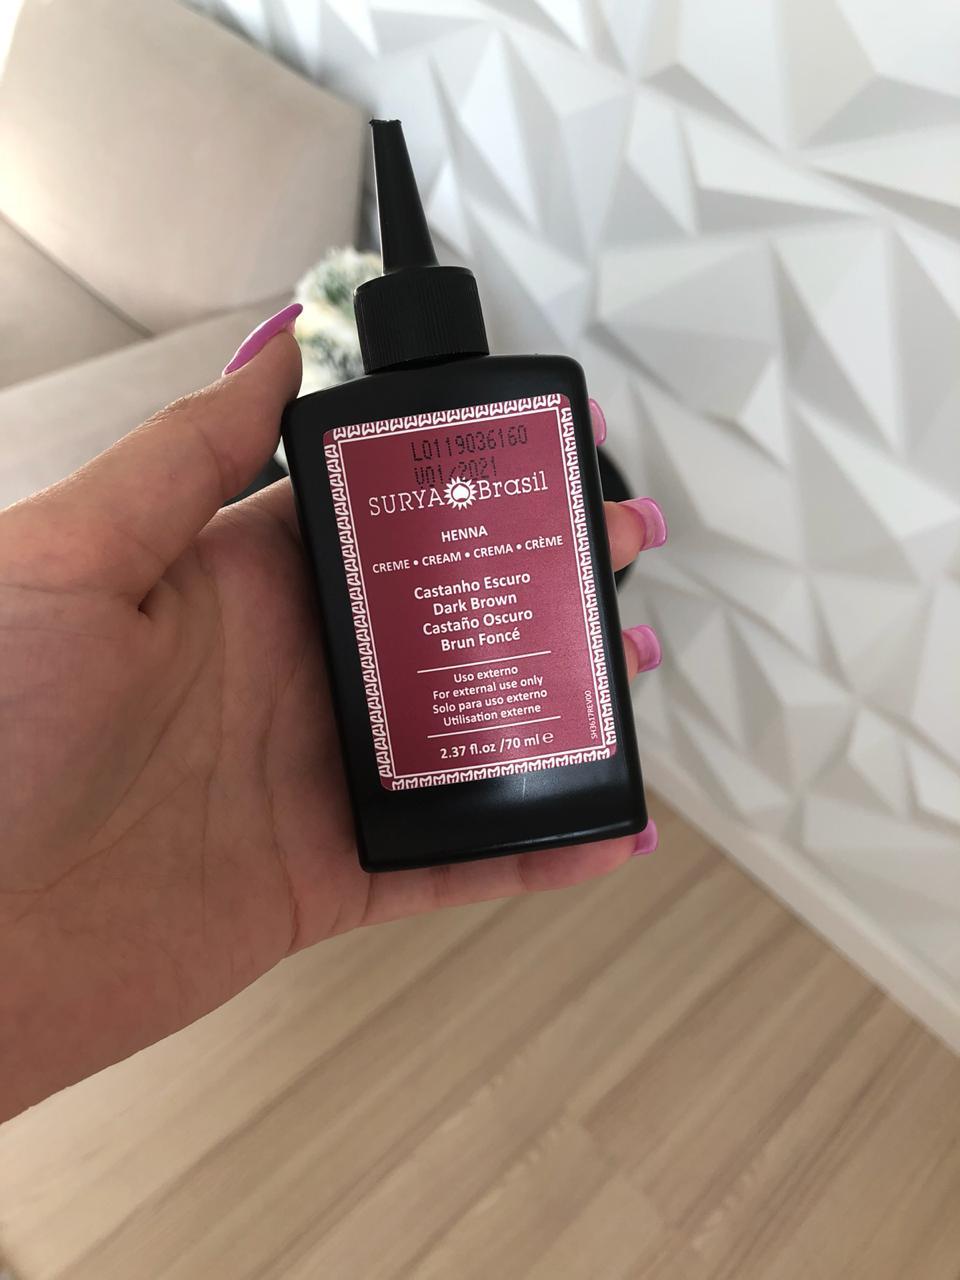 coloracao-cem-por-cento-vegana-henna-creme-da-surya-brasil-e-boa-resenha-tinta